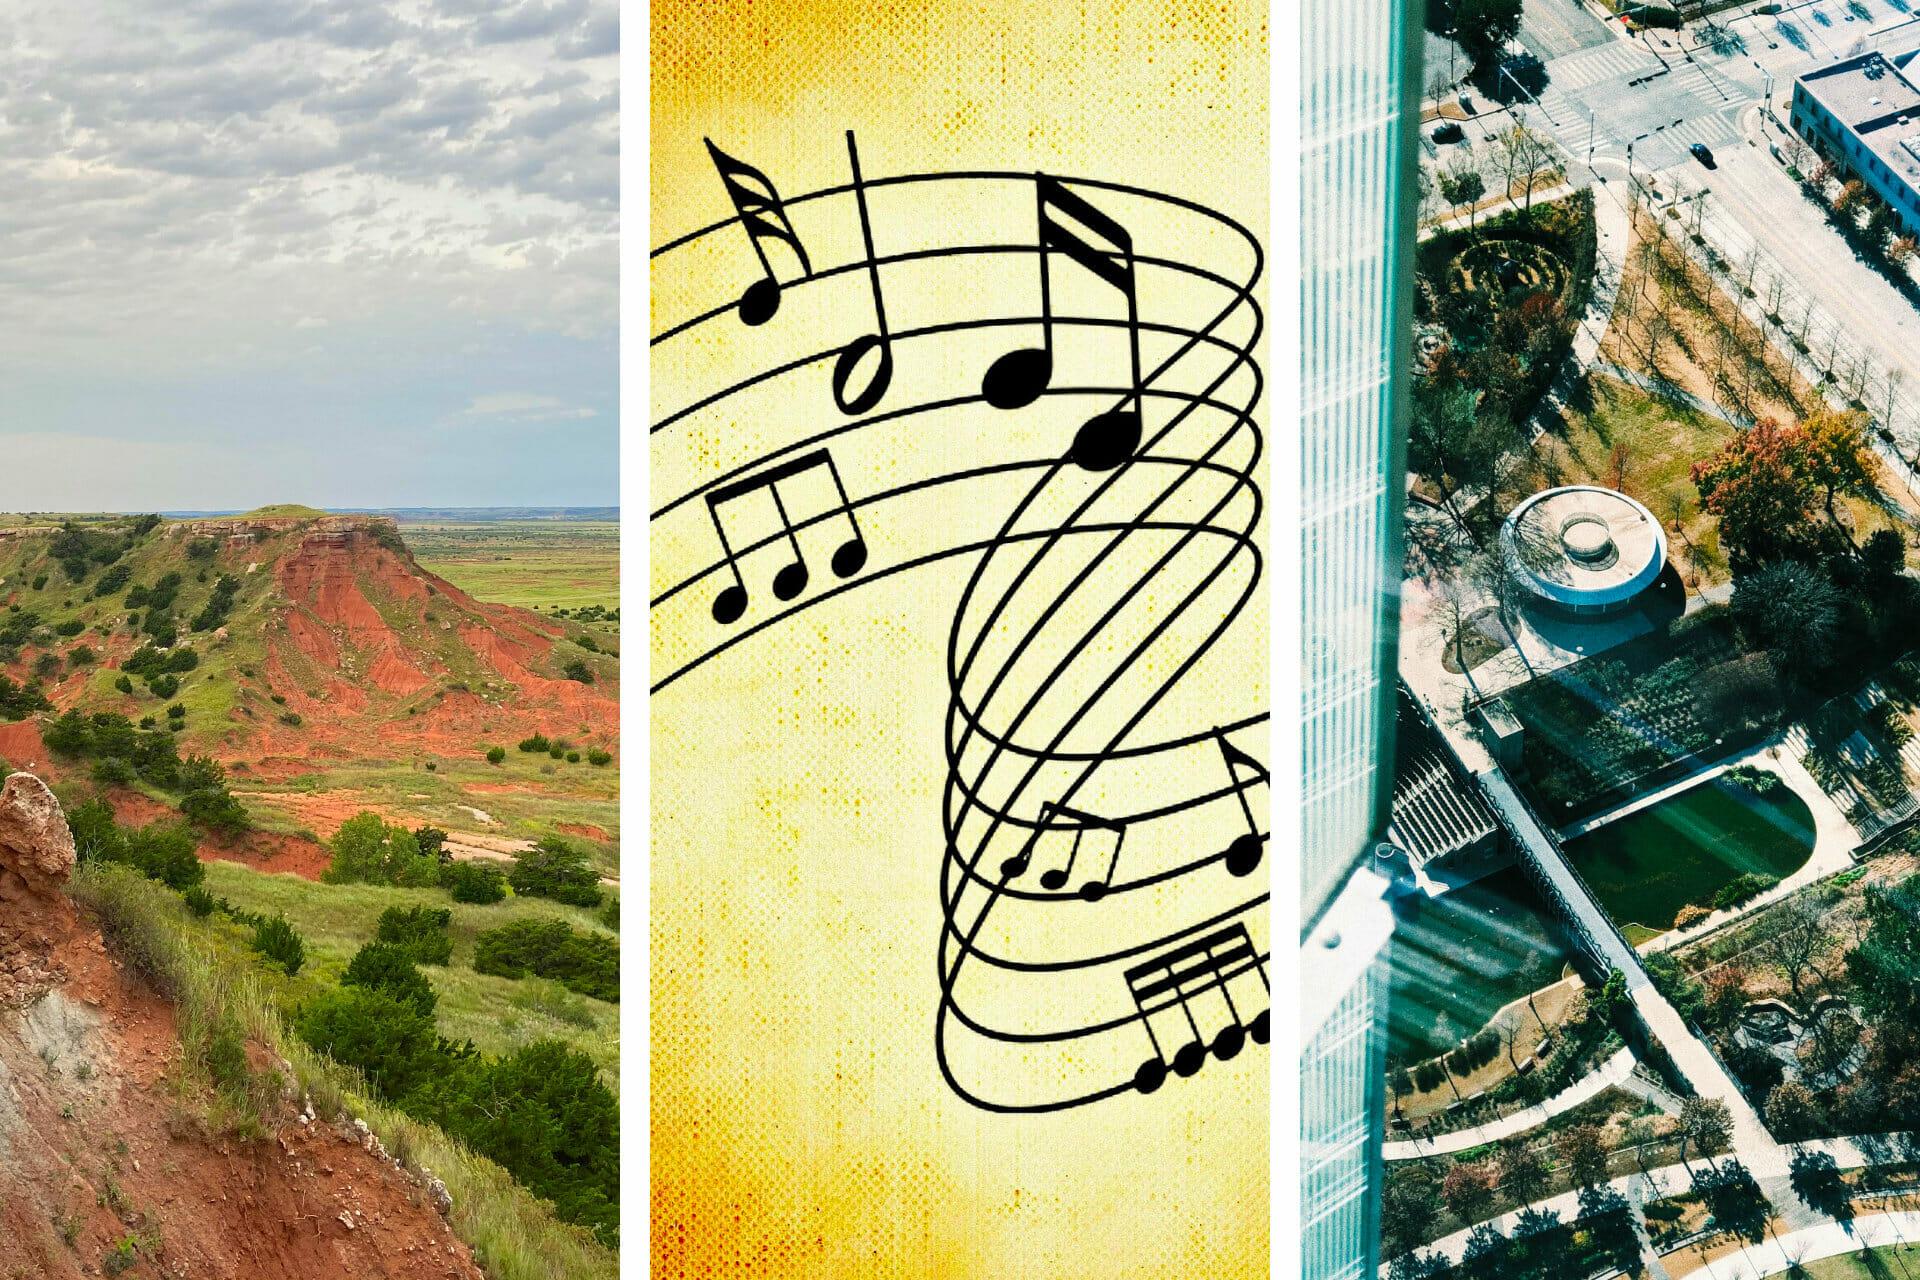 19+ Songs about Oklahoma to Make You Feel at Home via @allamericanatlas